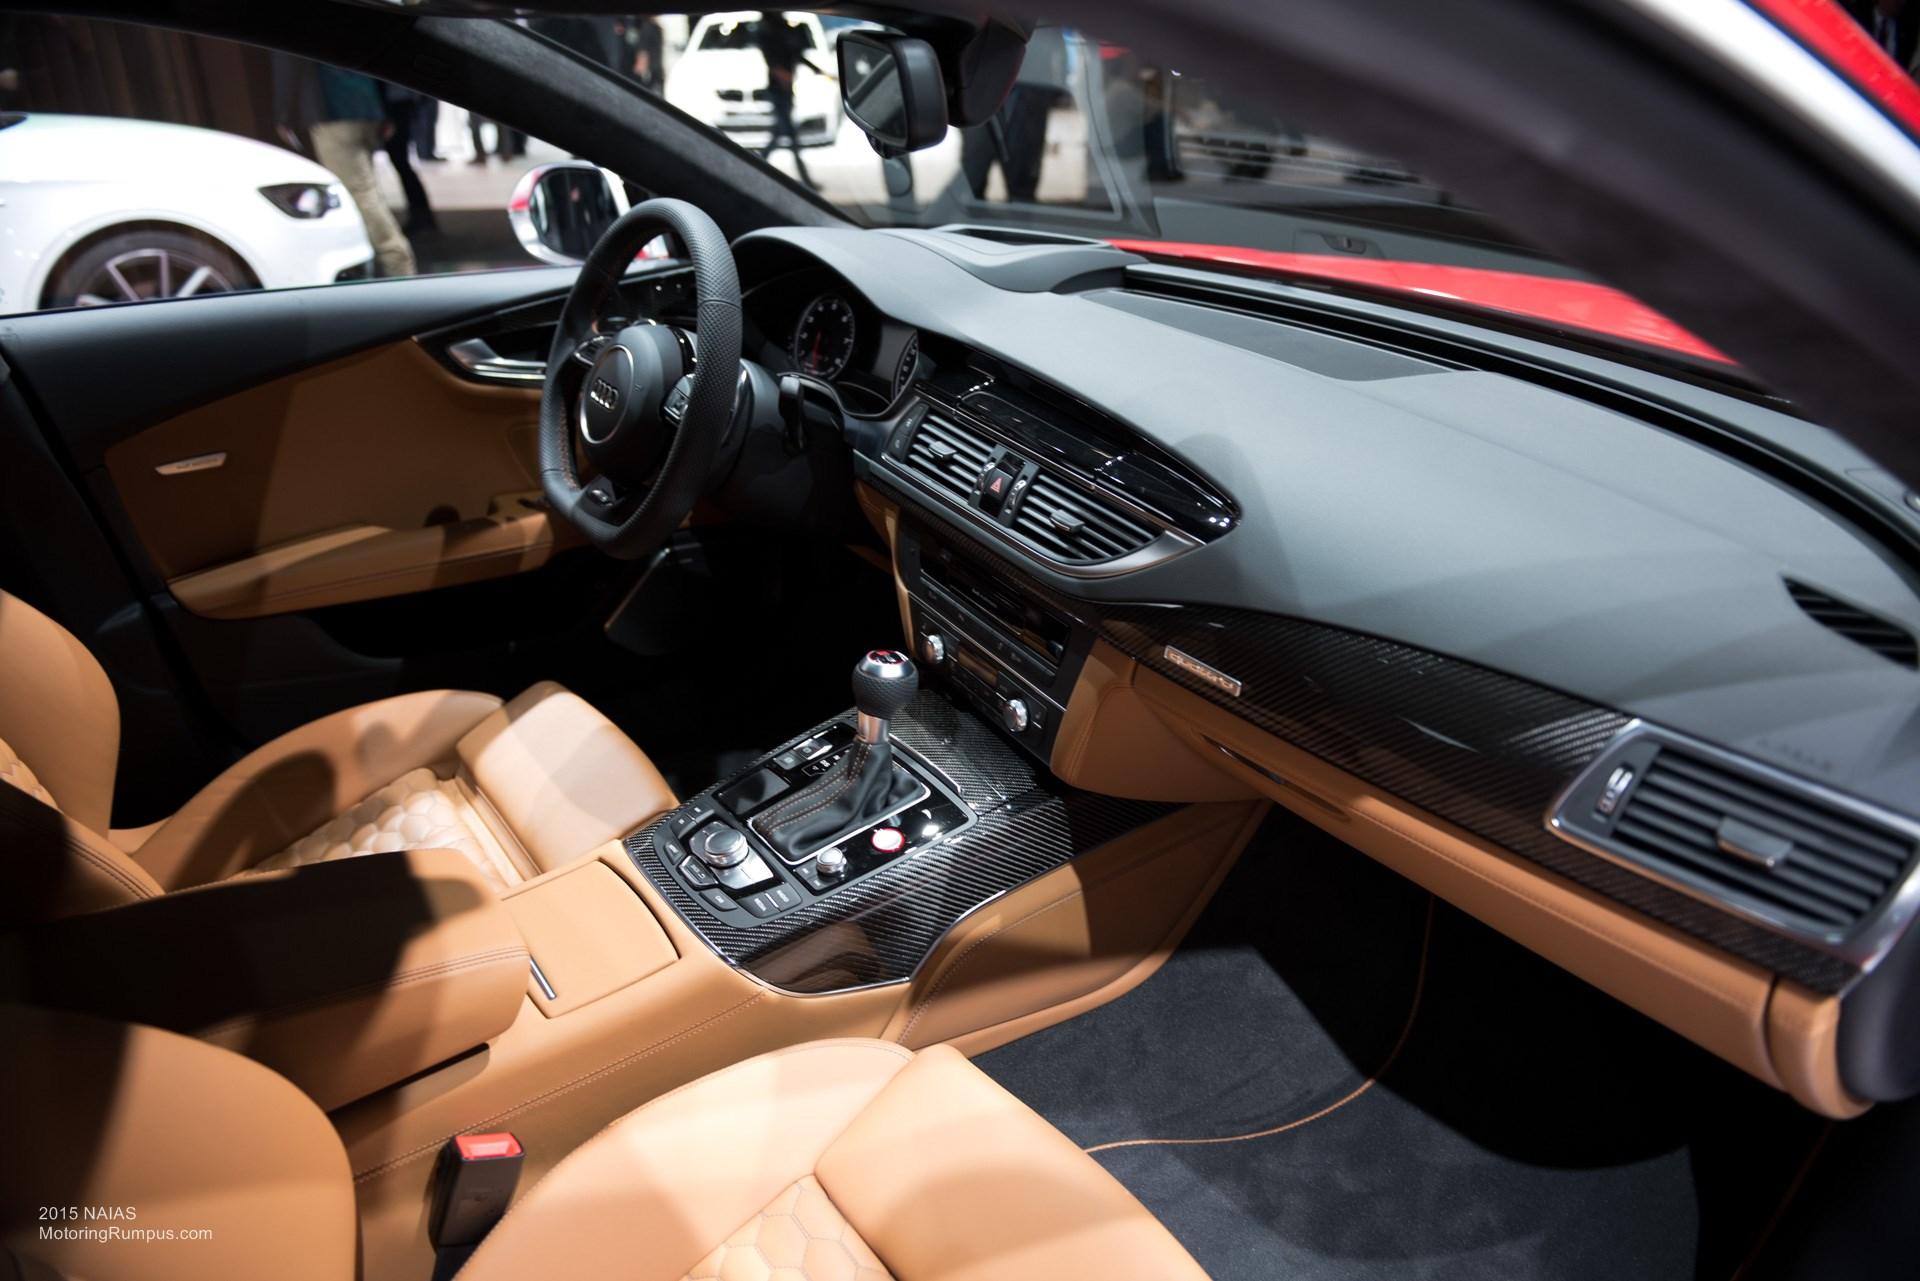 2015 NAIAS Audi RS7 Brown Interior